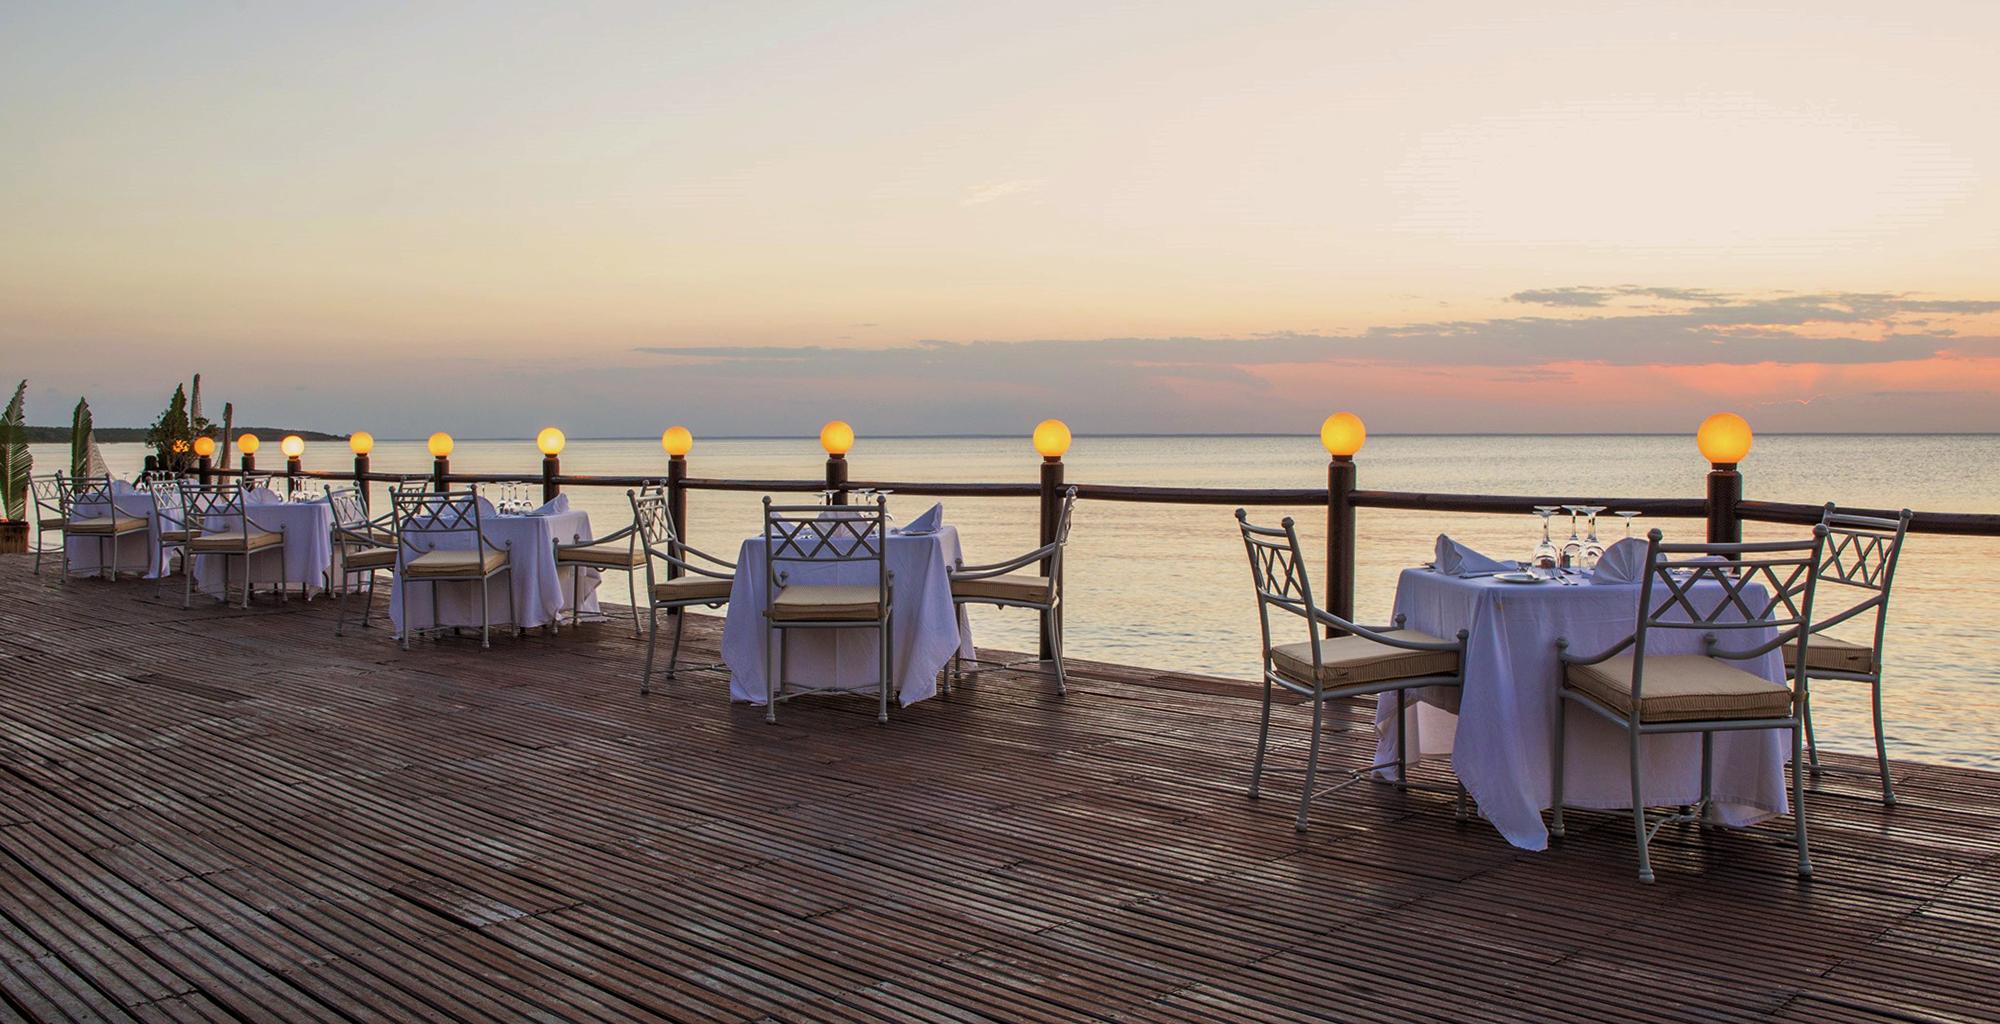 Mozambique-Bazaruto-Archipelago-Anantara-Deck-Dining